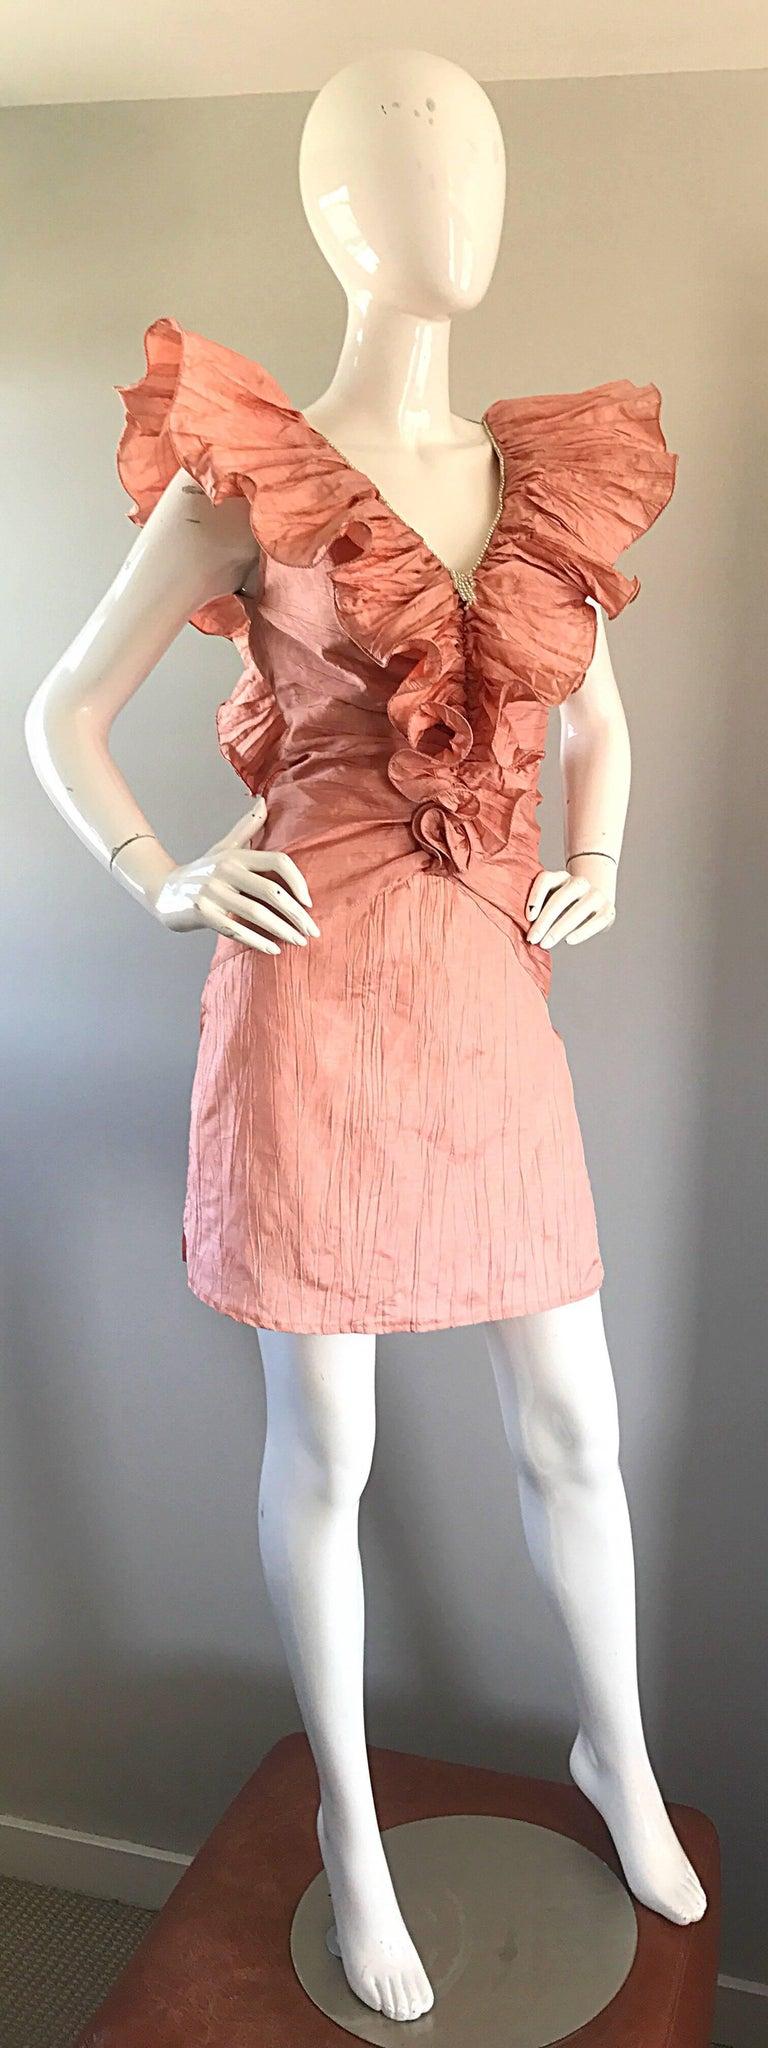 Avant Garde 1980s Pink Rhinestones + Ruffles   Sleeveless 80s Cocktail Dress For Sale 5